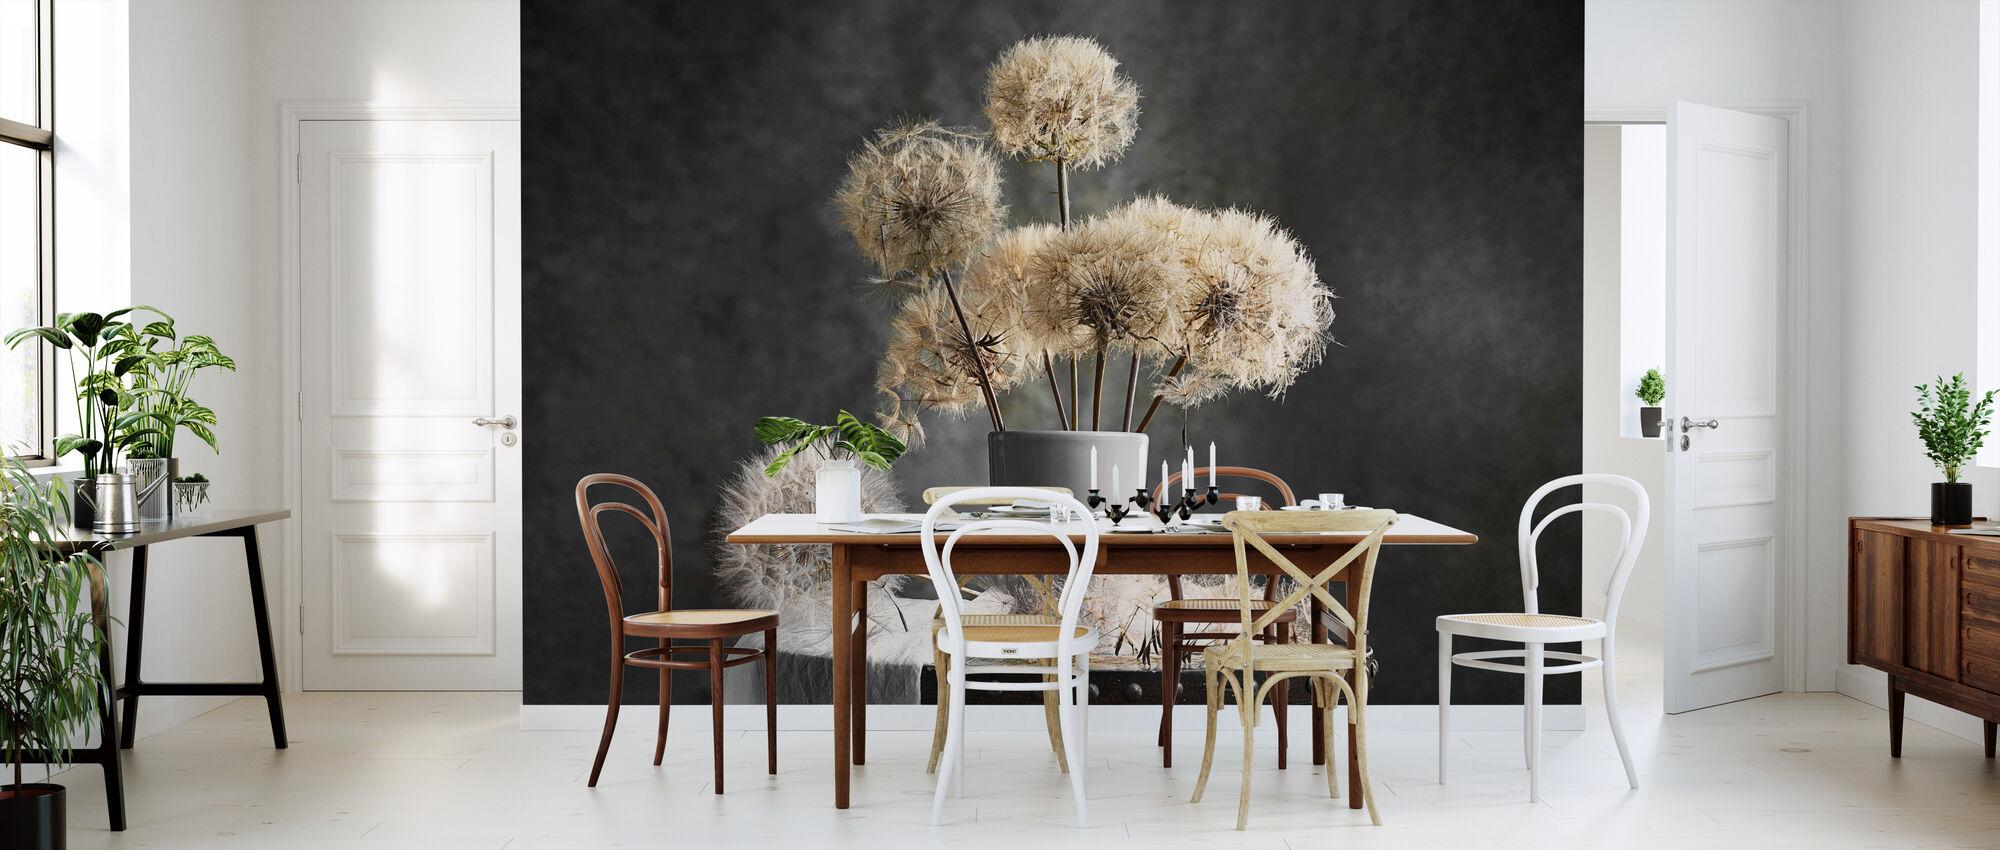 Dandelion Seed Pod - Wallpaper - Kitchen